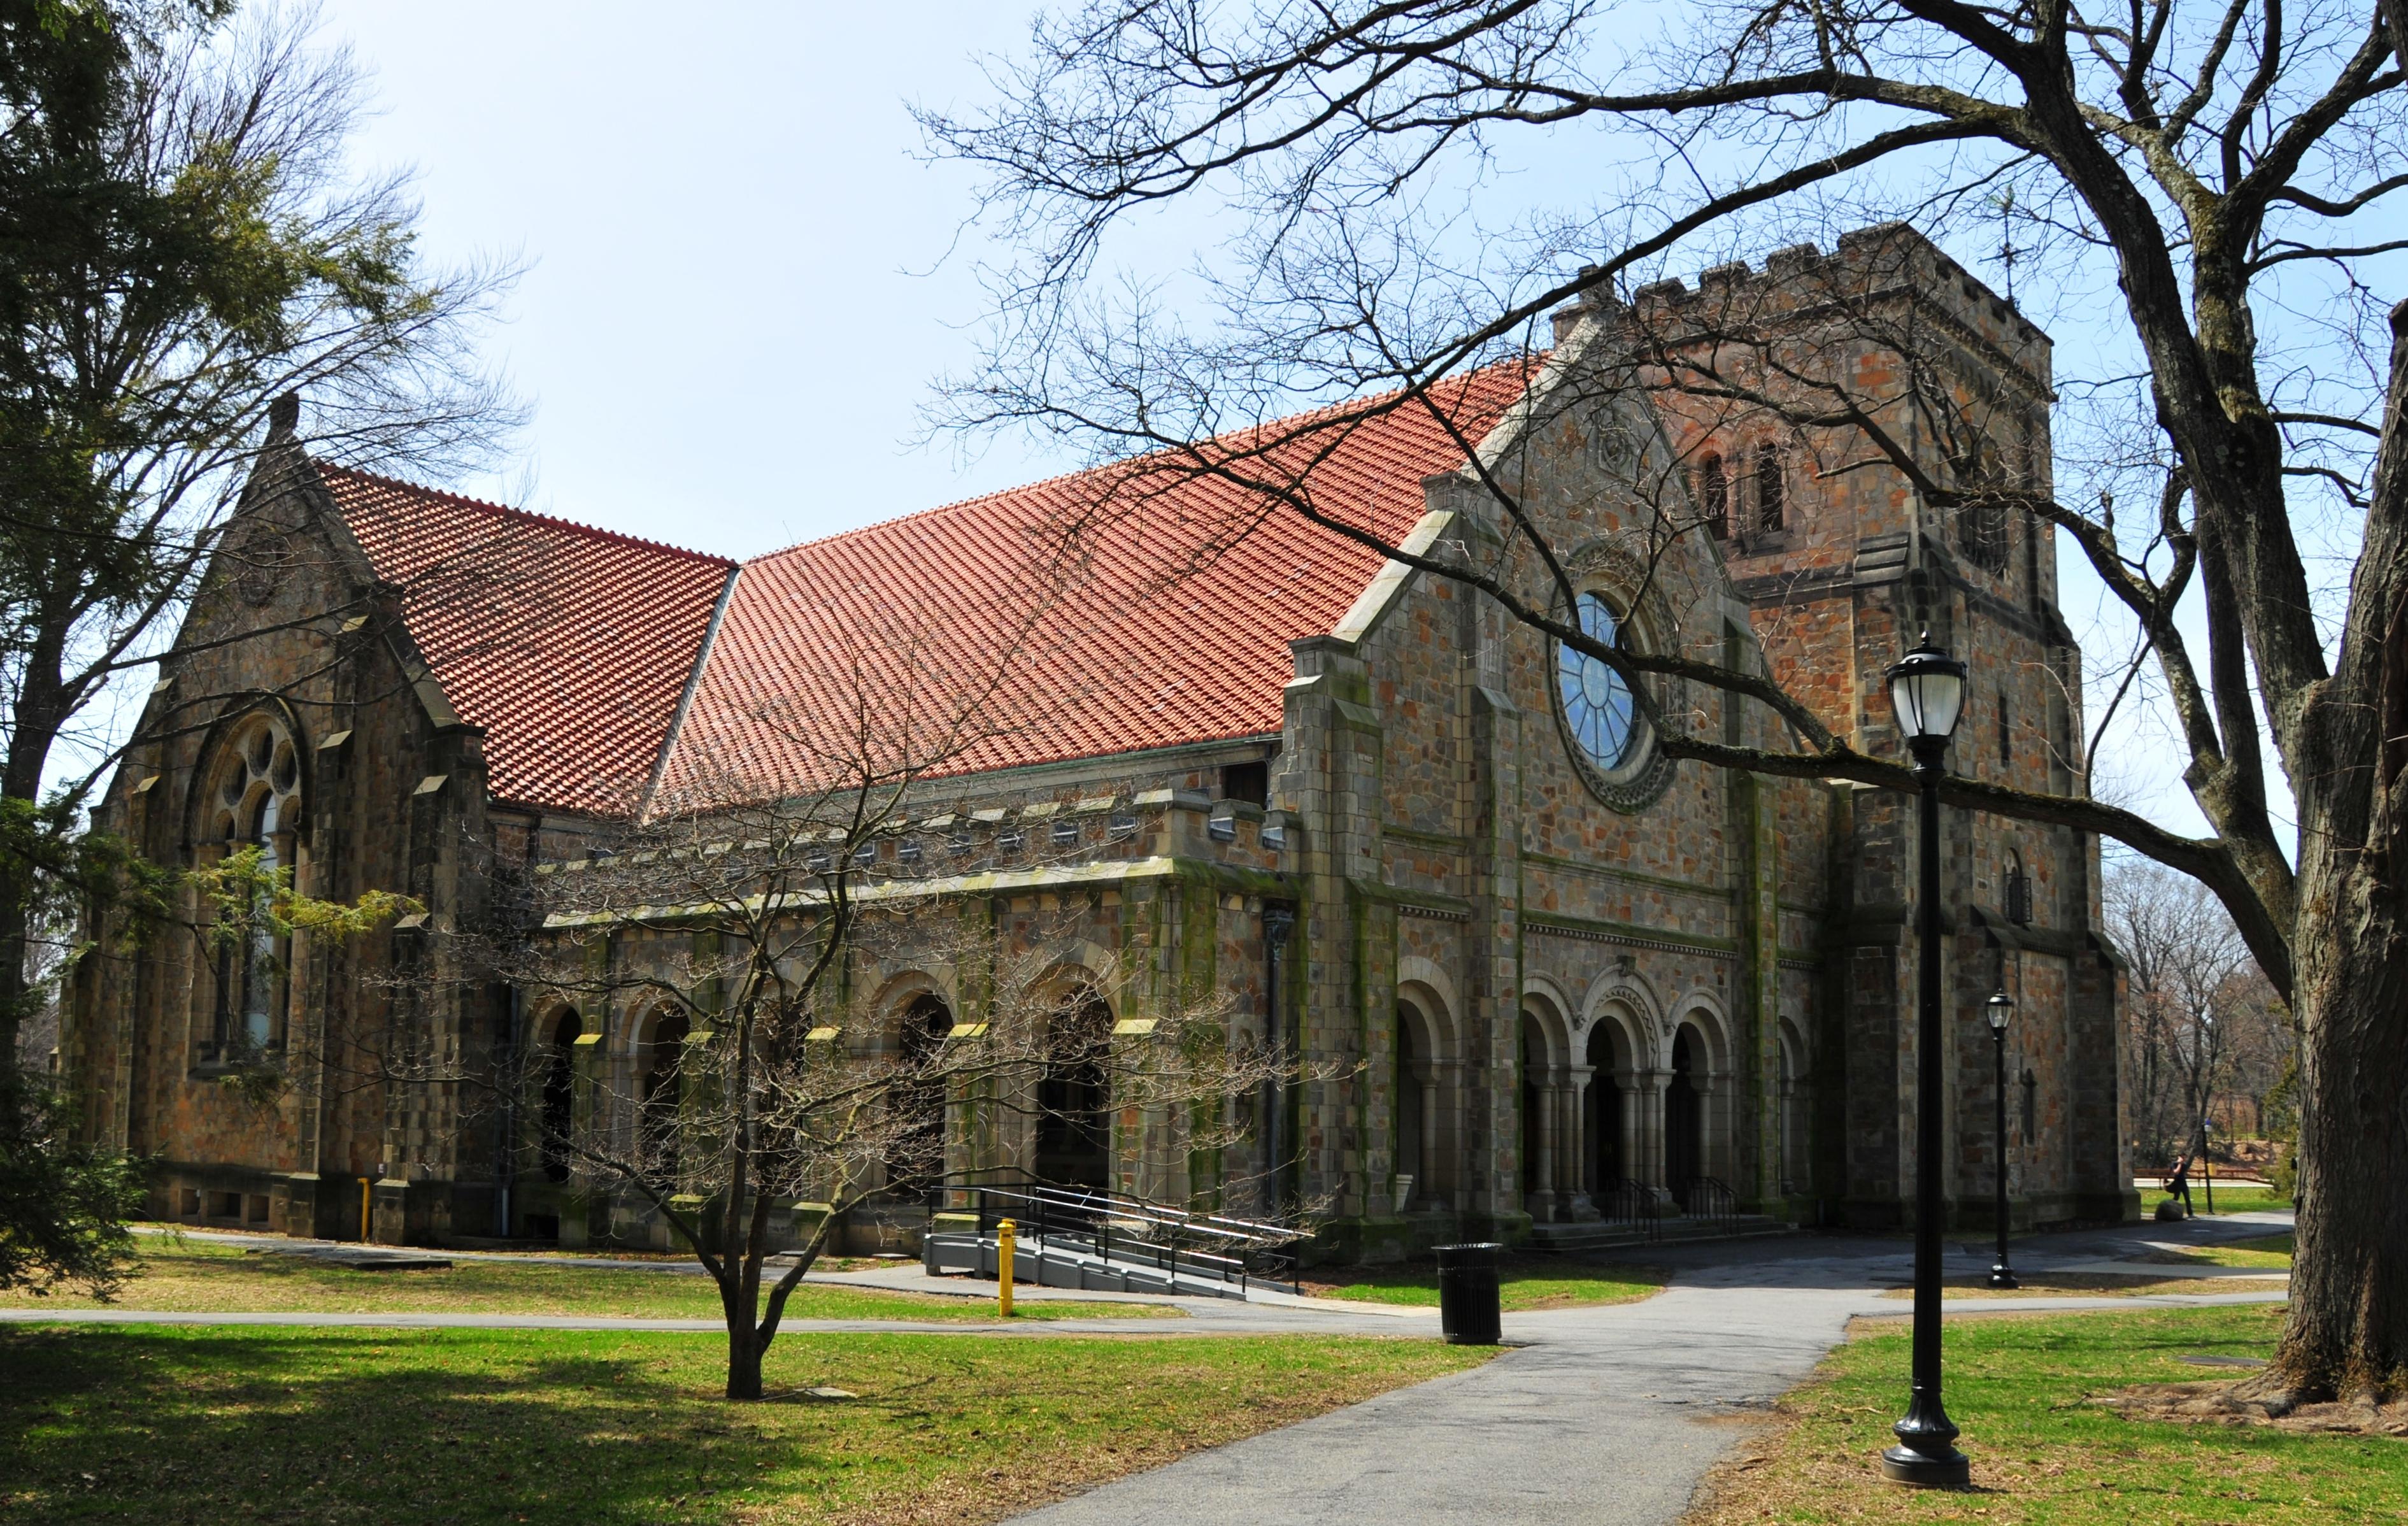 Vassar College Chapel - Ceremony - 124 Raymond Ave, Poughkeepsie, NY, 12604